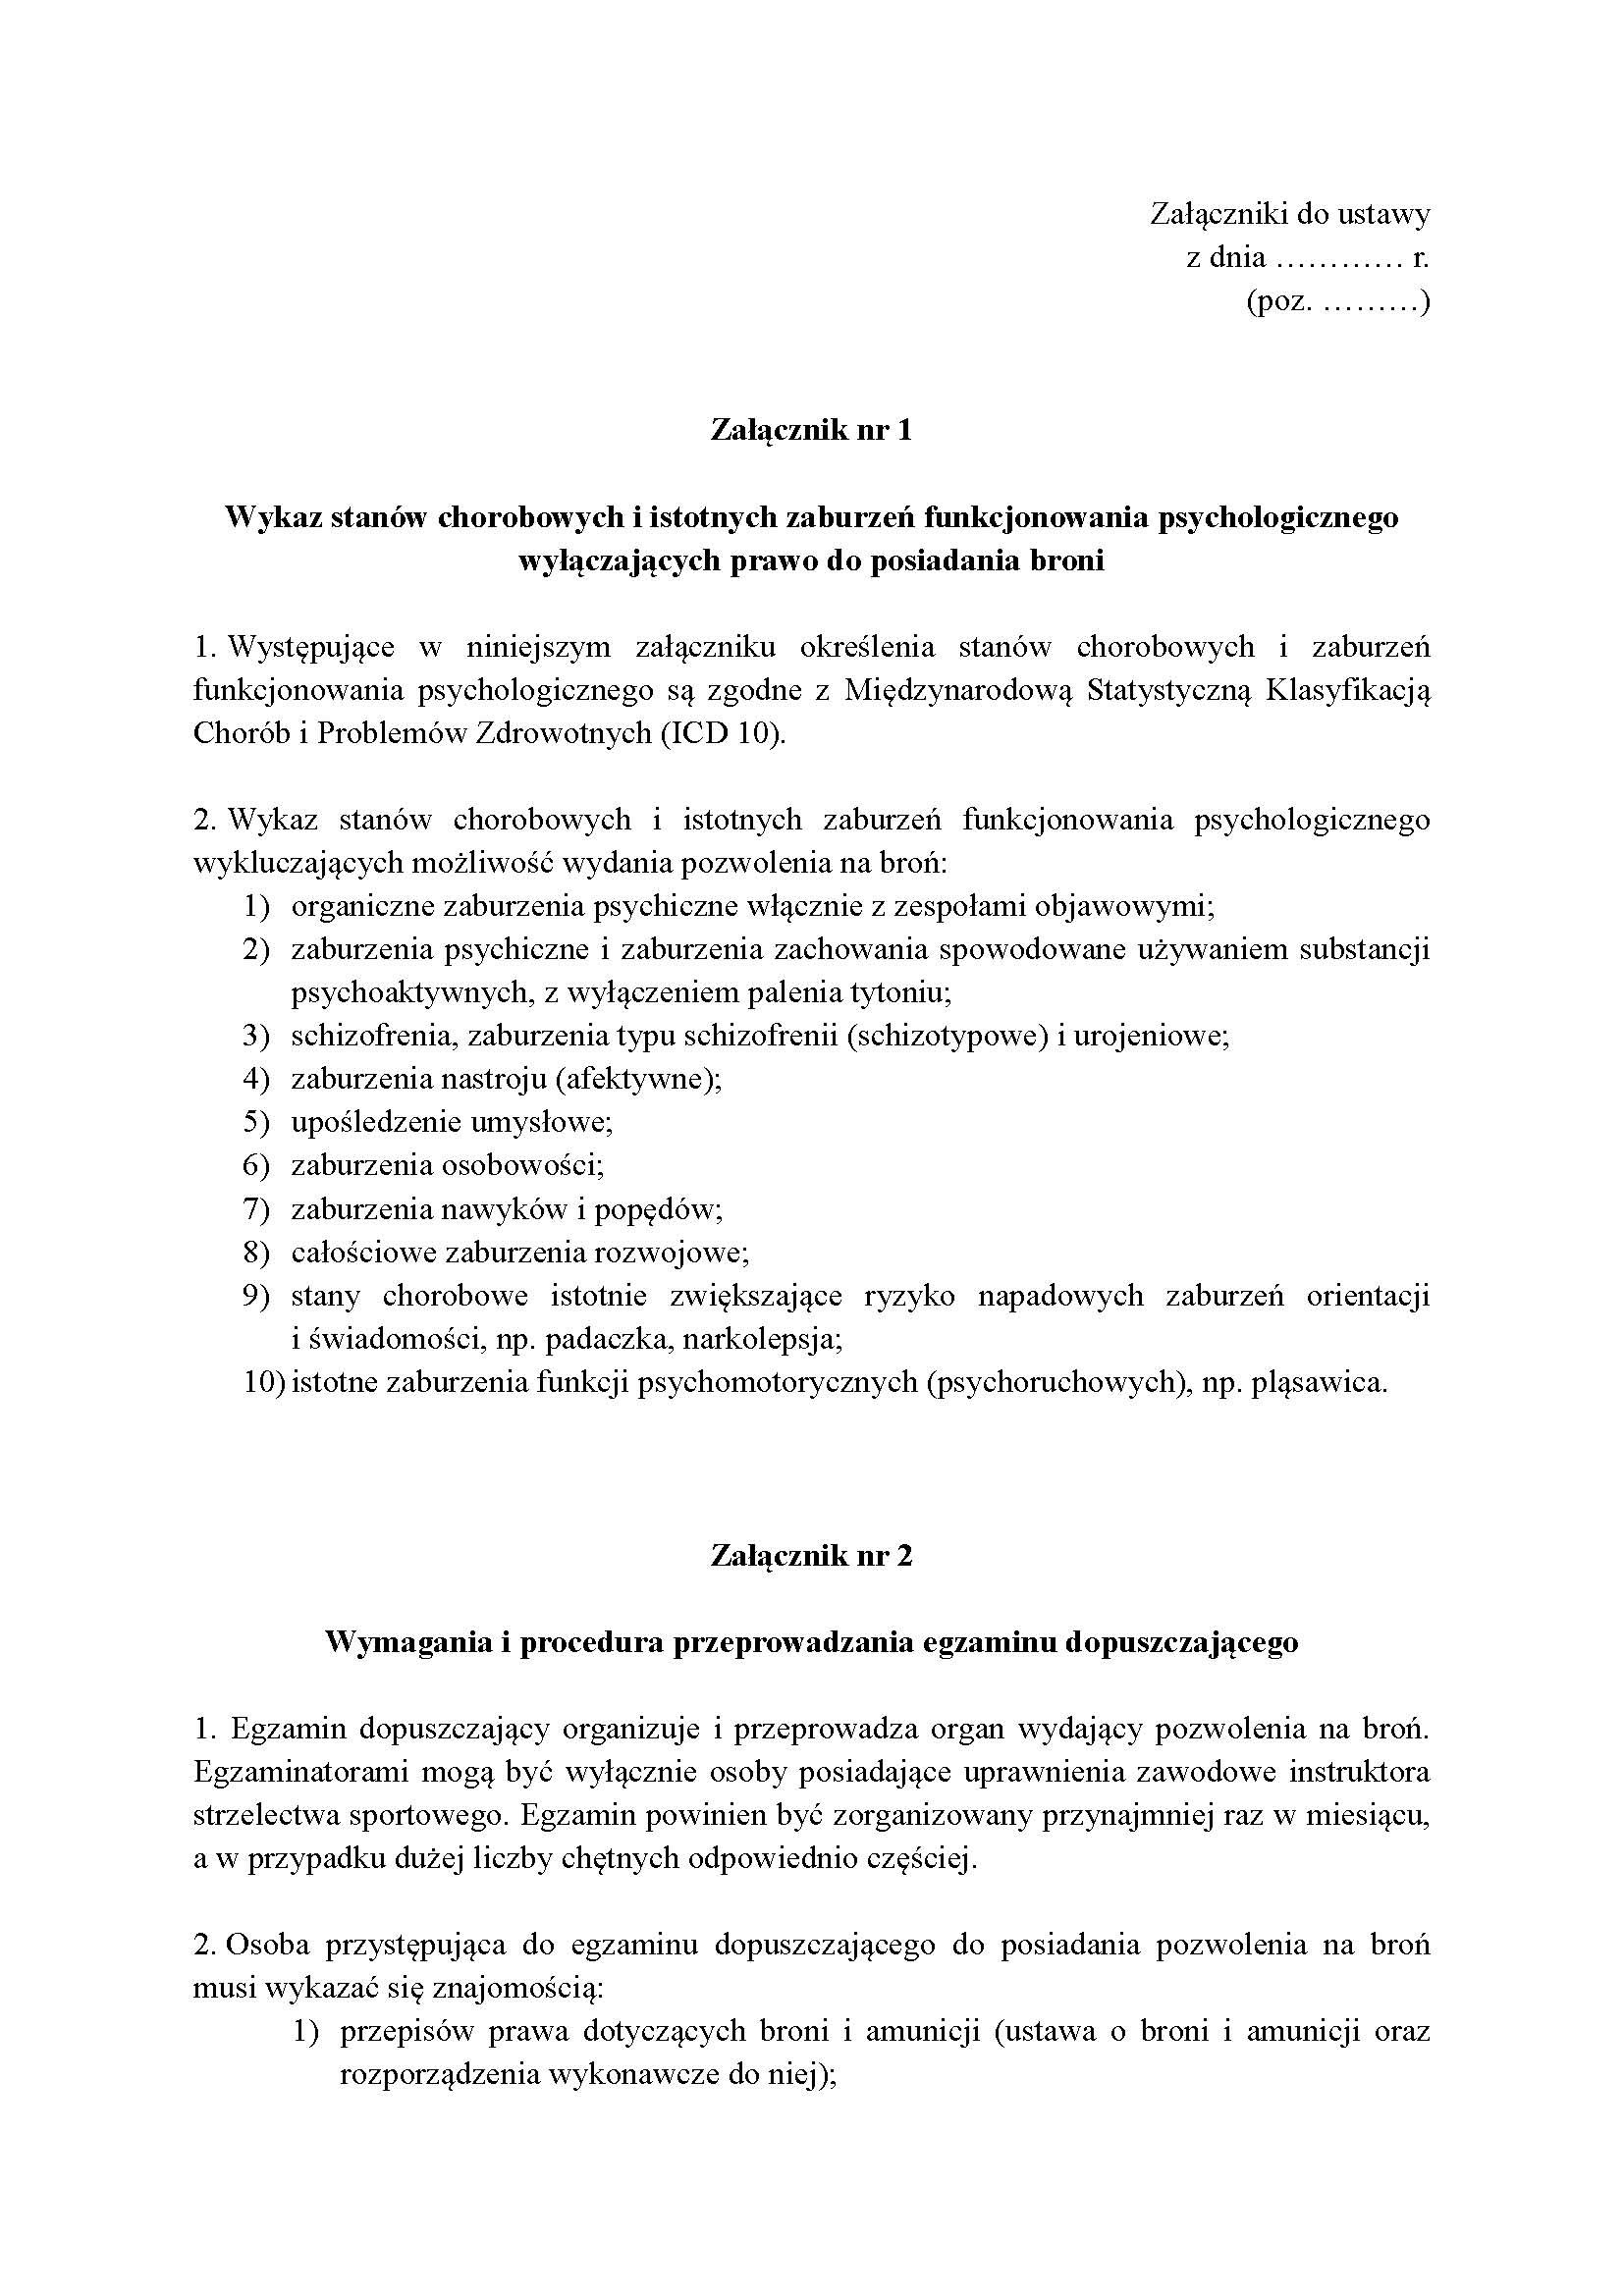 FRSwP_projekt_ustawy_20151125_Strona_21